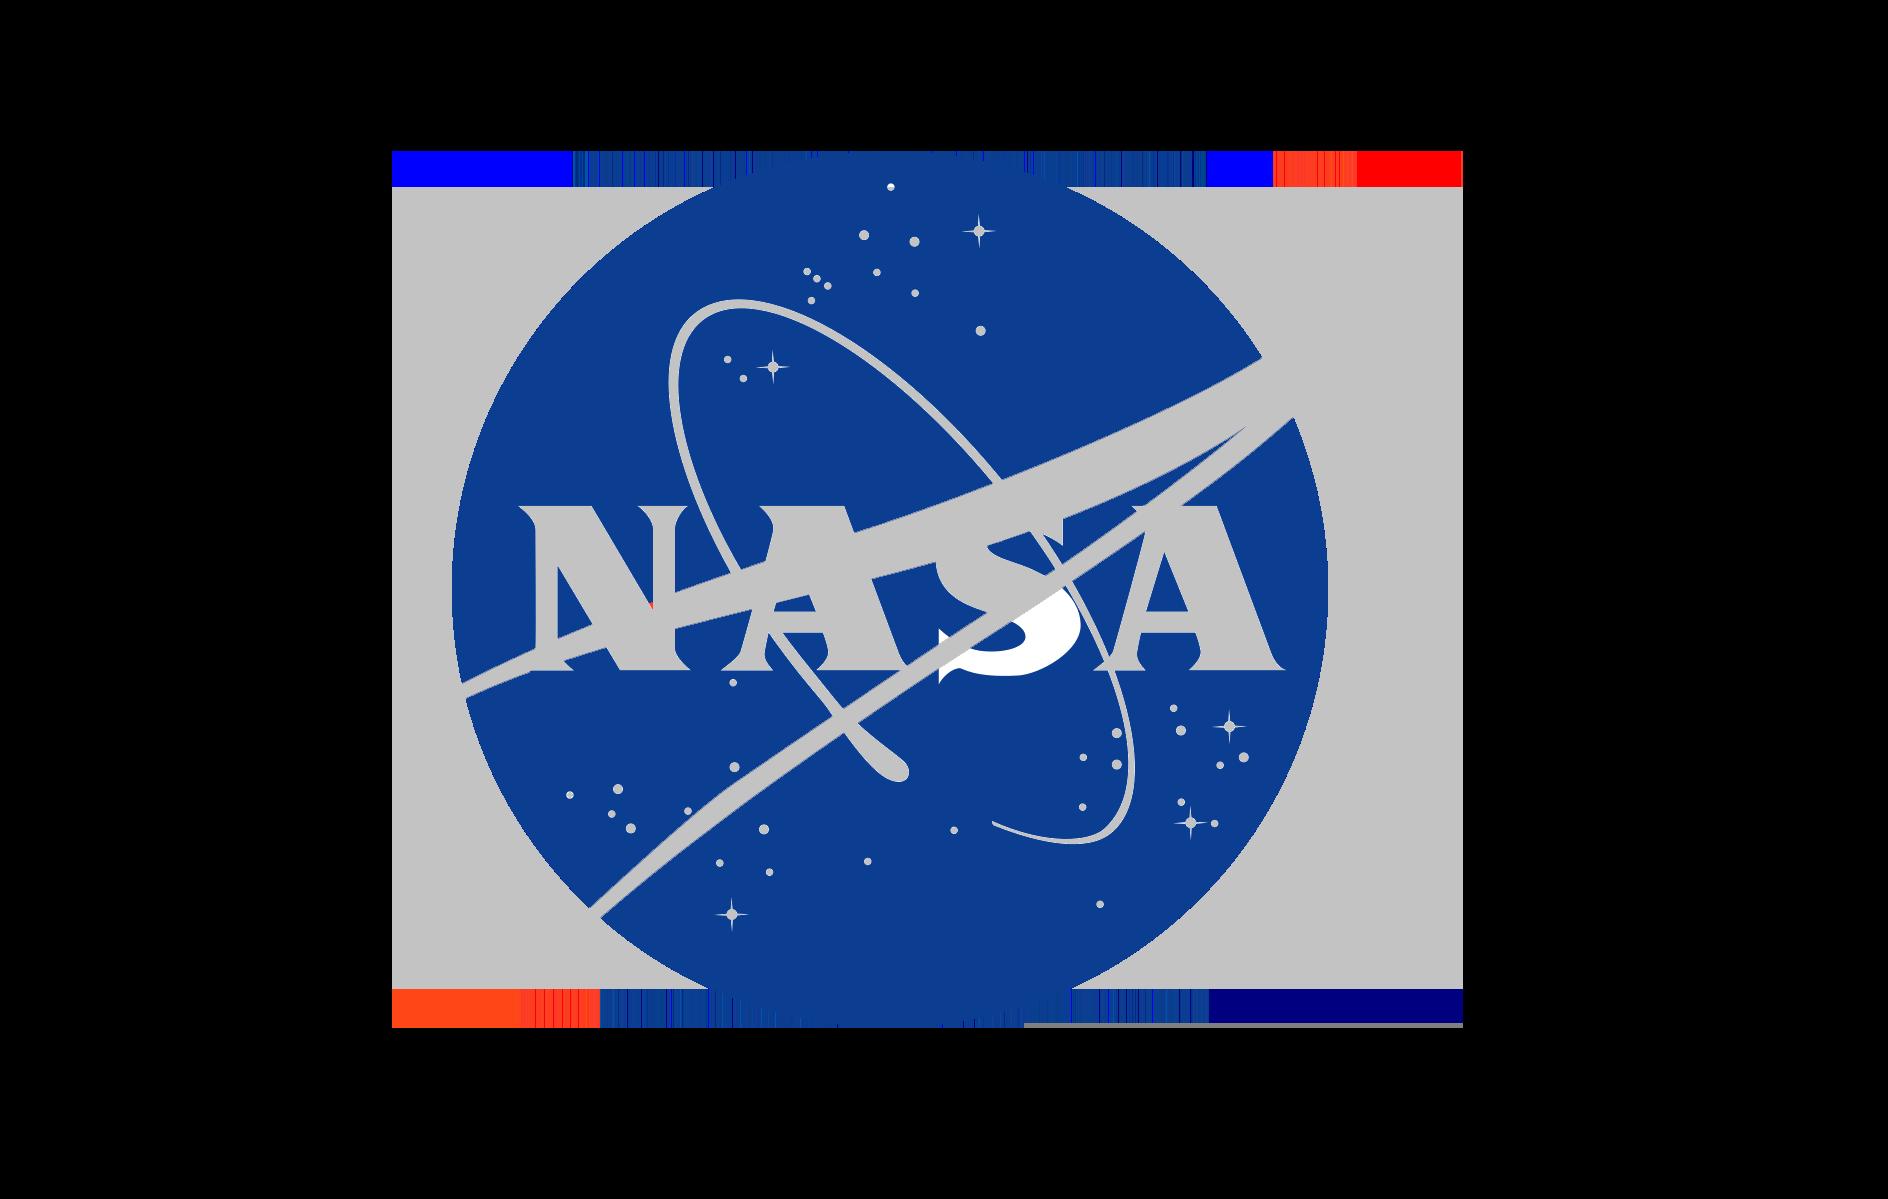 nasa-logo-alt